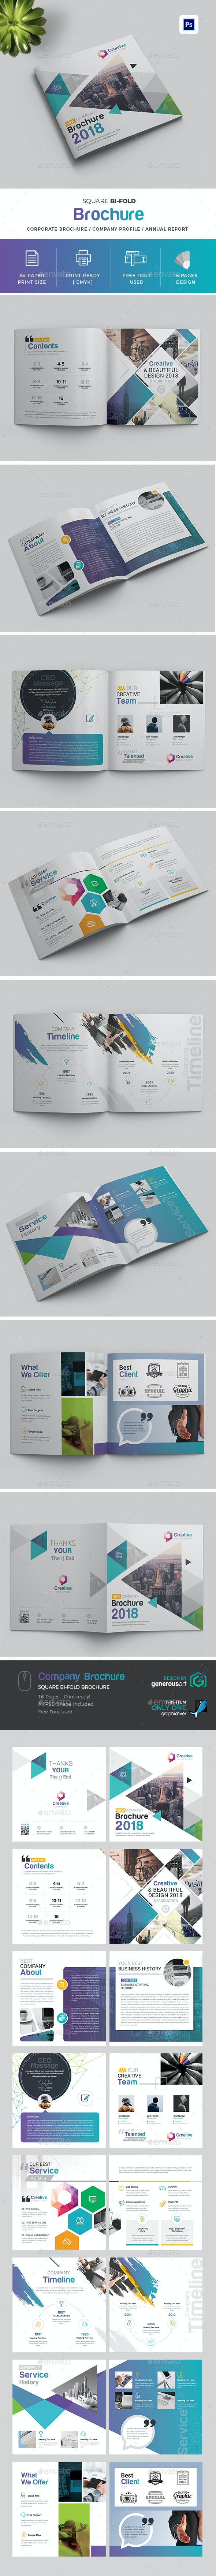 2018 Square Bi-Fold Brochure - Brochures Print Templates